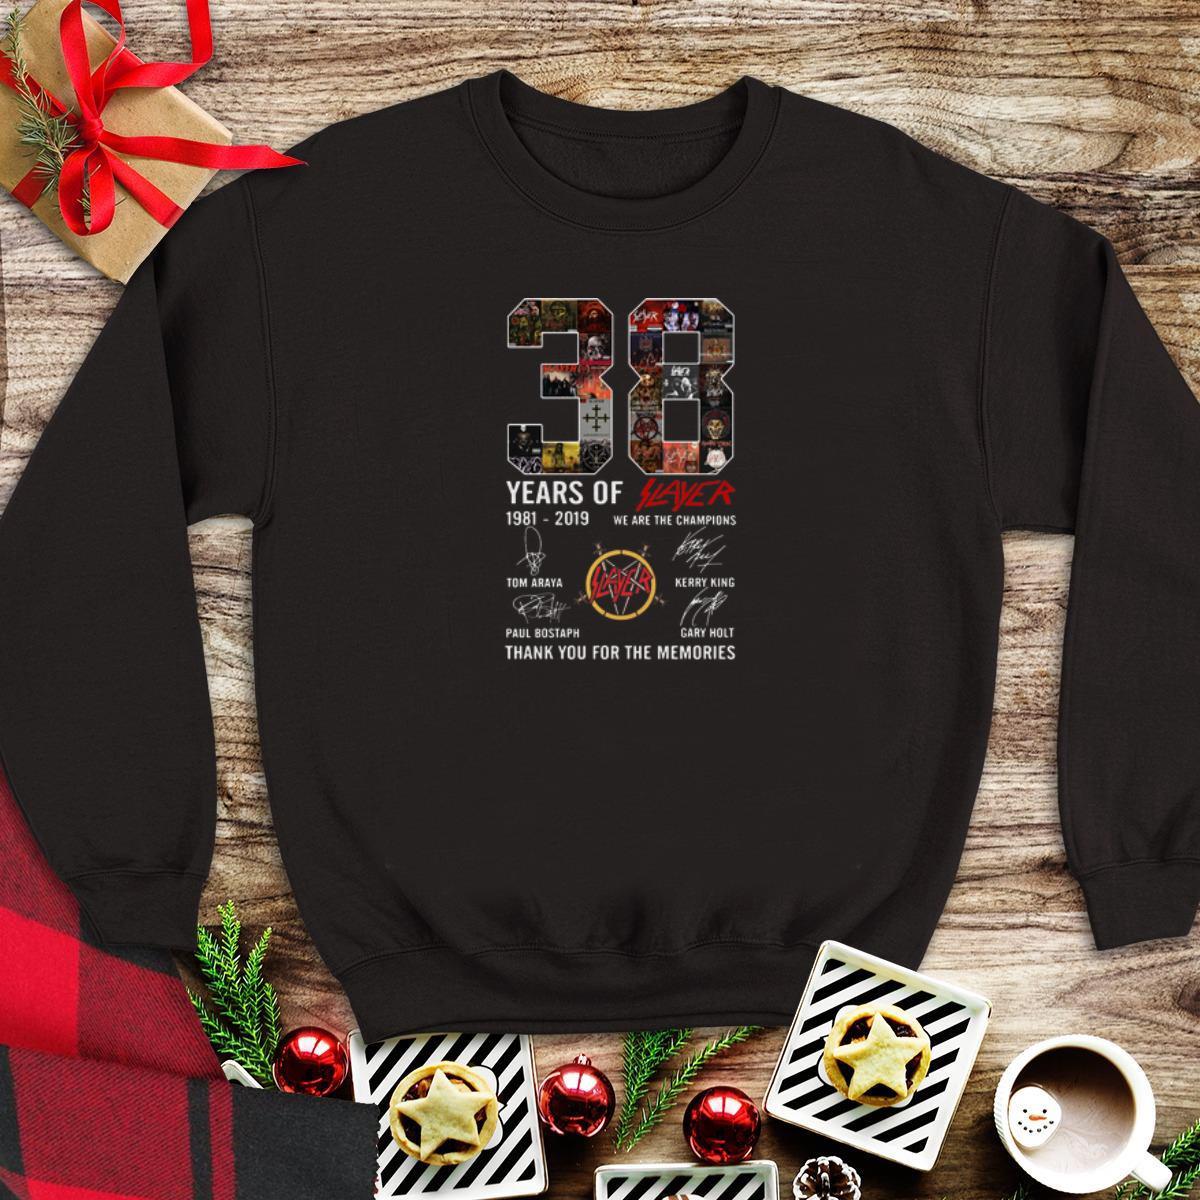 38 Years Of Slayer 1981 2019 signature sweater 1 - 38 Years Of Slayer 1981-2019 signature sweater